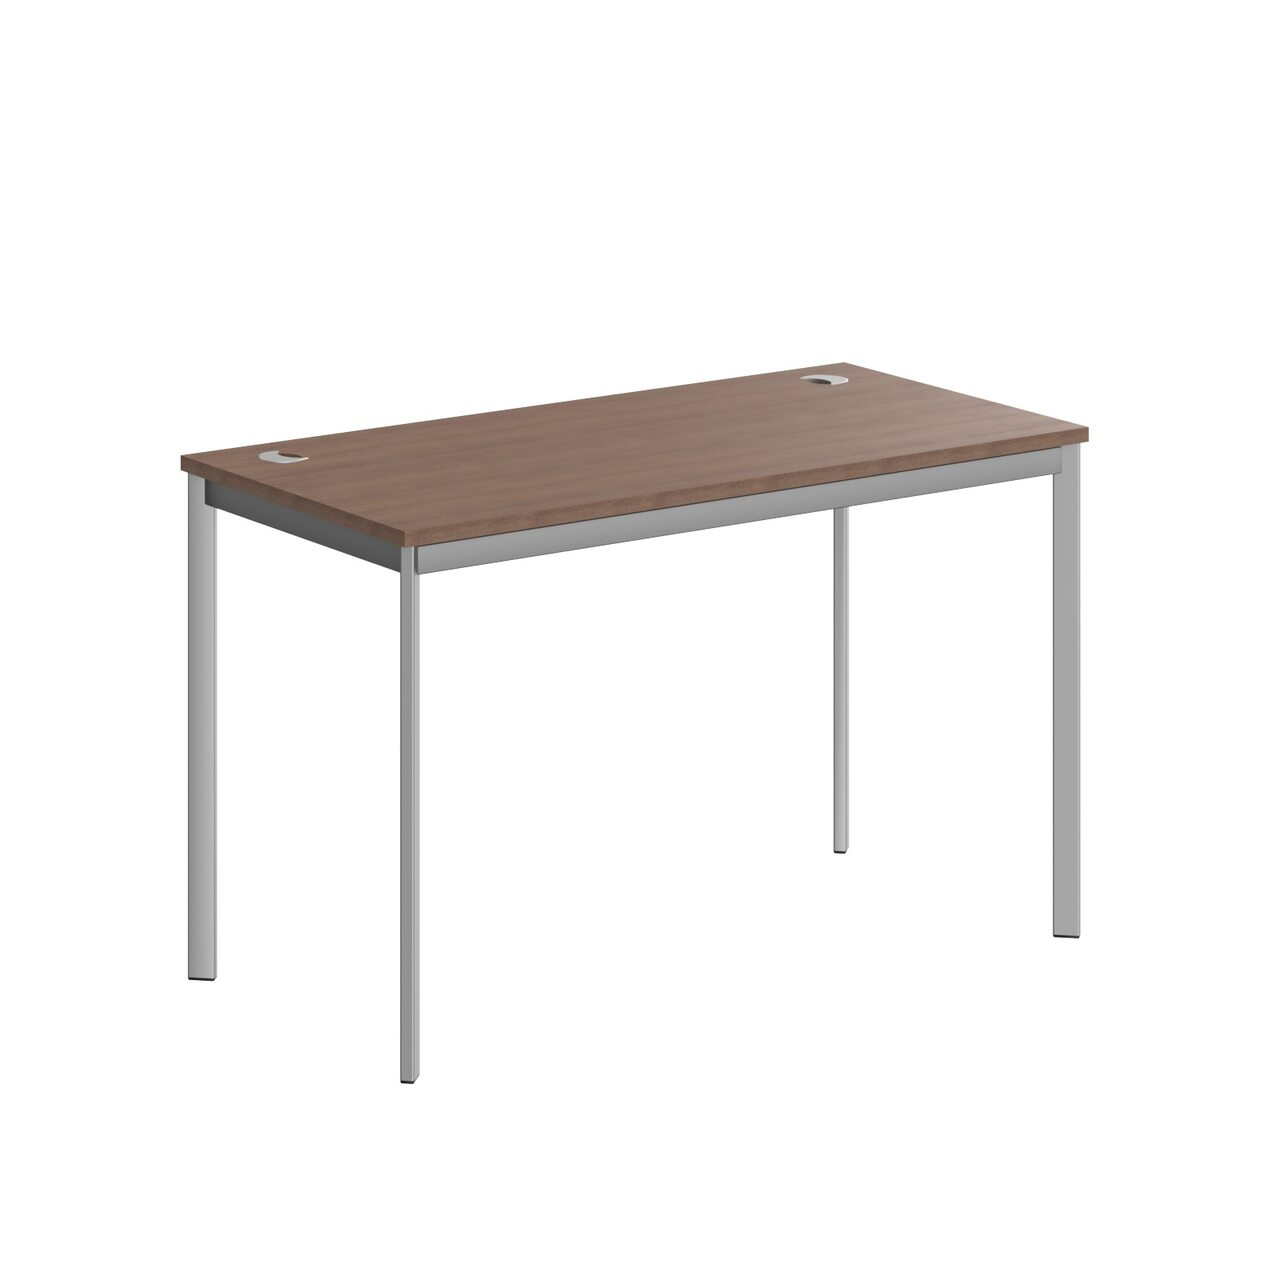 Стол прямой  IMAGO-S 120x60x76 - фото 4